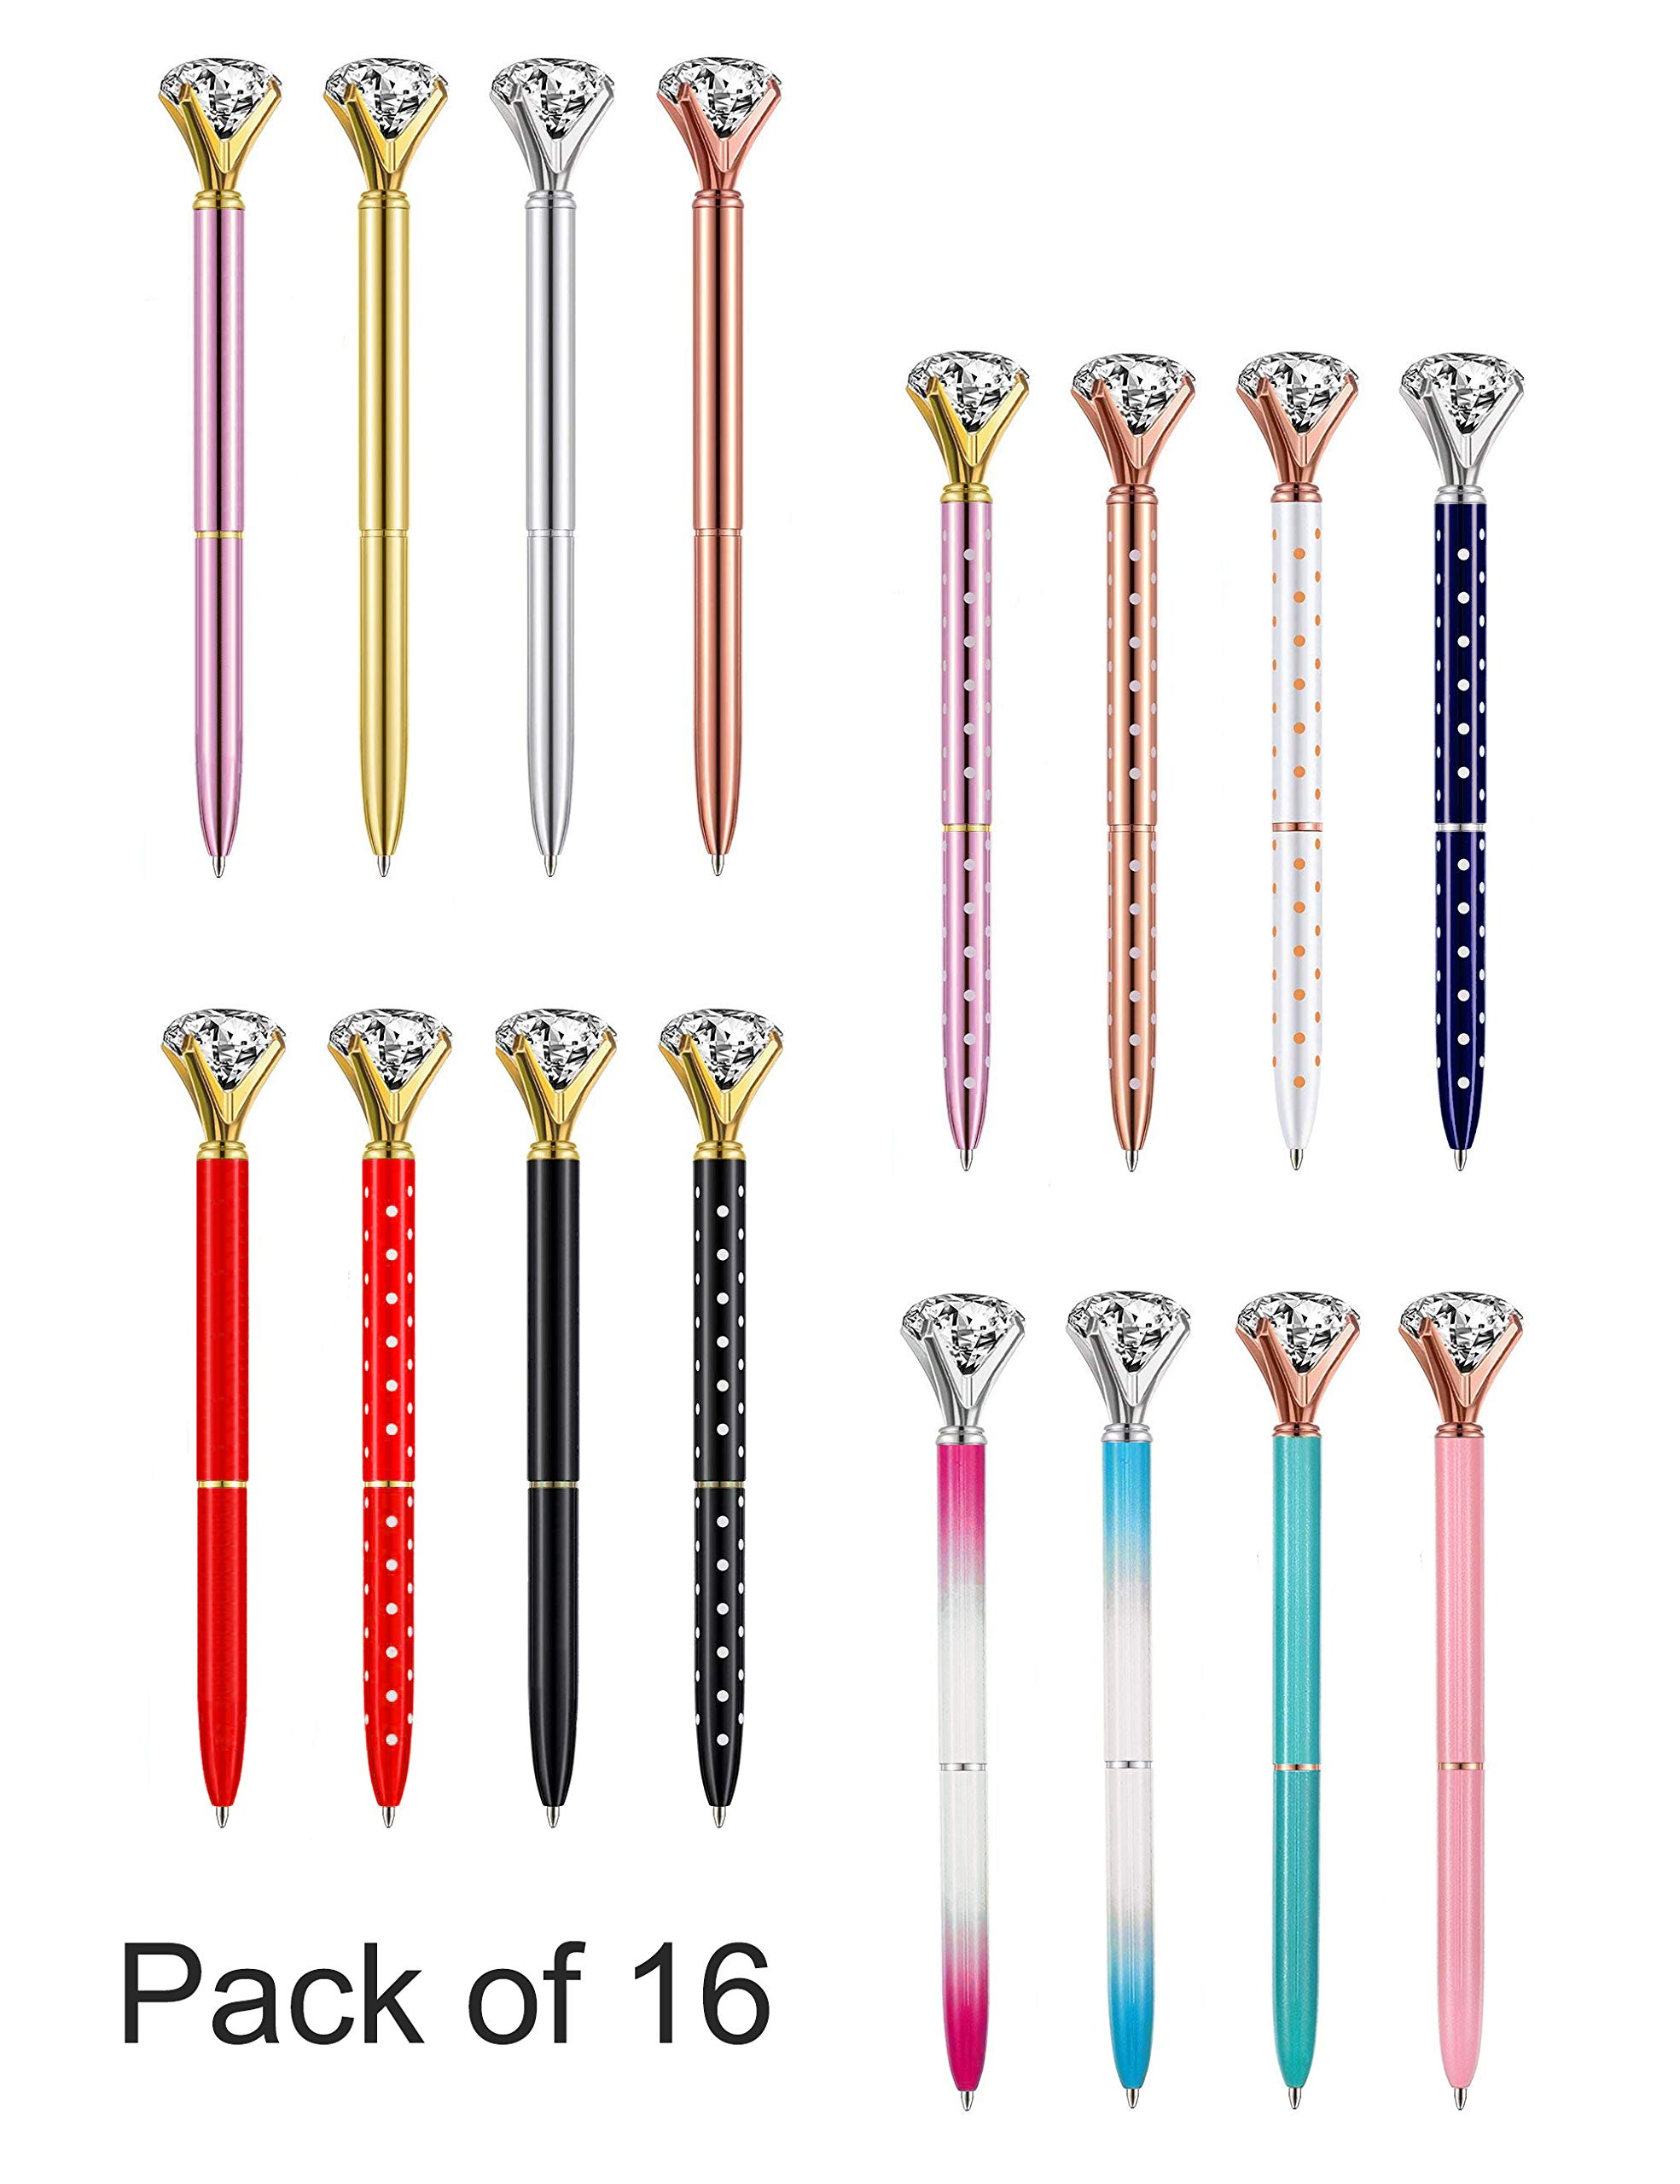 Diamond Pens CuteBallpoint Pens Diamond Pen Office SuppliesDécorGifts for Women Bridesmaid CoworkersRose GoldCool FunFancyNoveltyCrystal Metal School Desk Accessories Black Ink Pack of 16